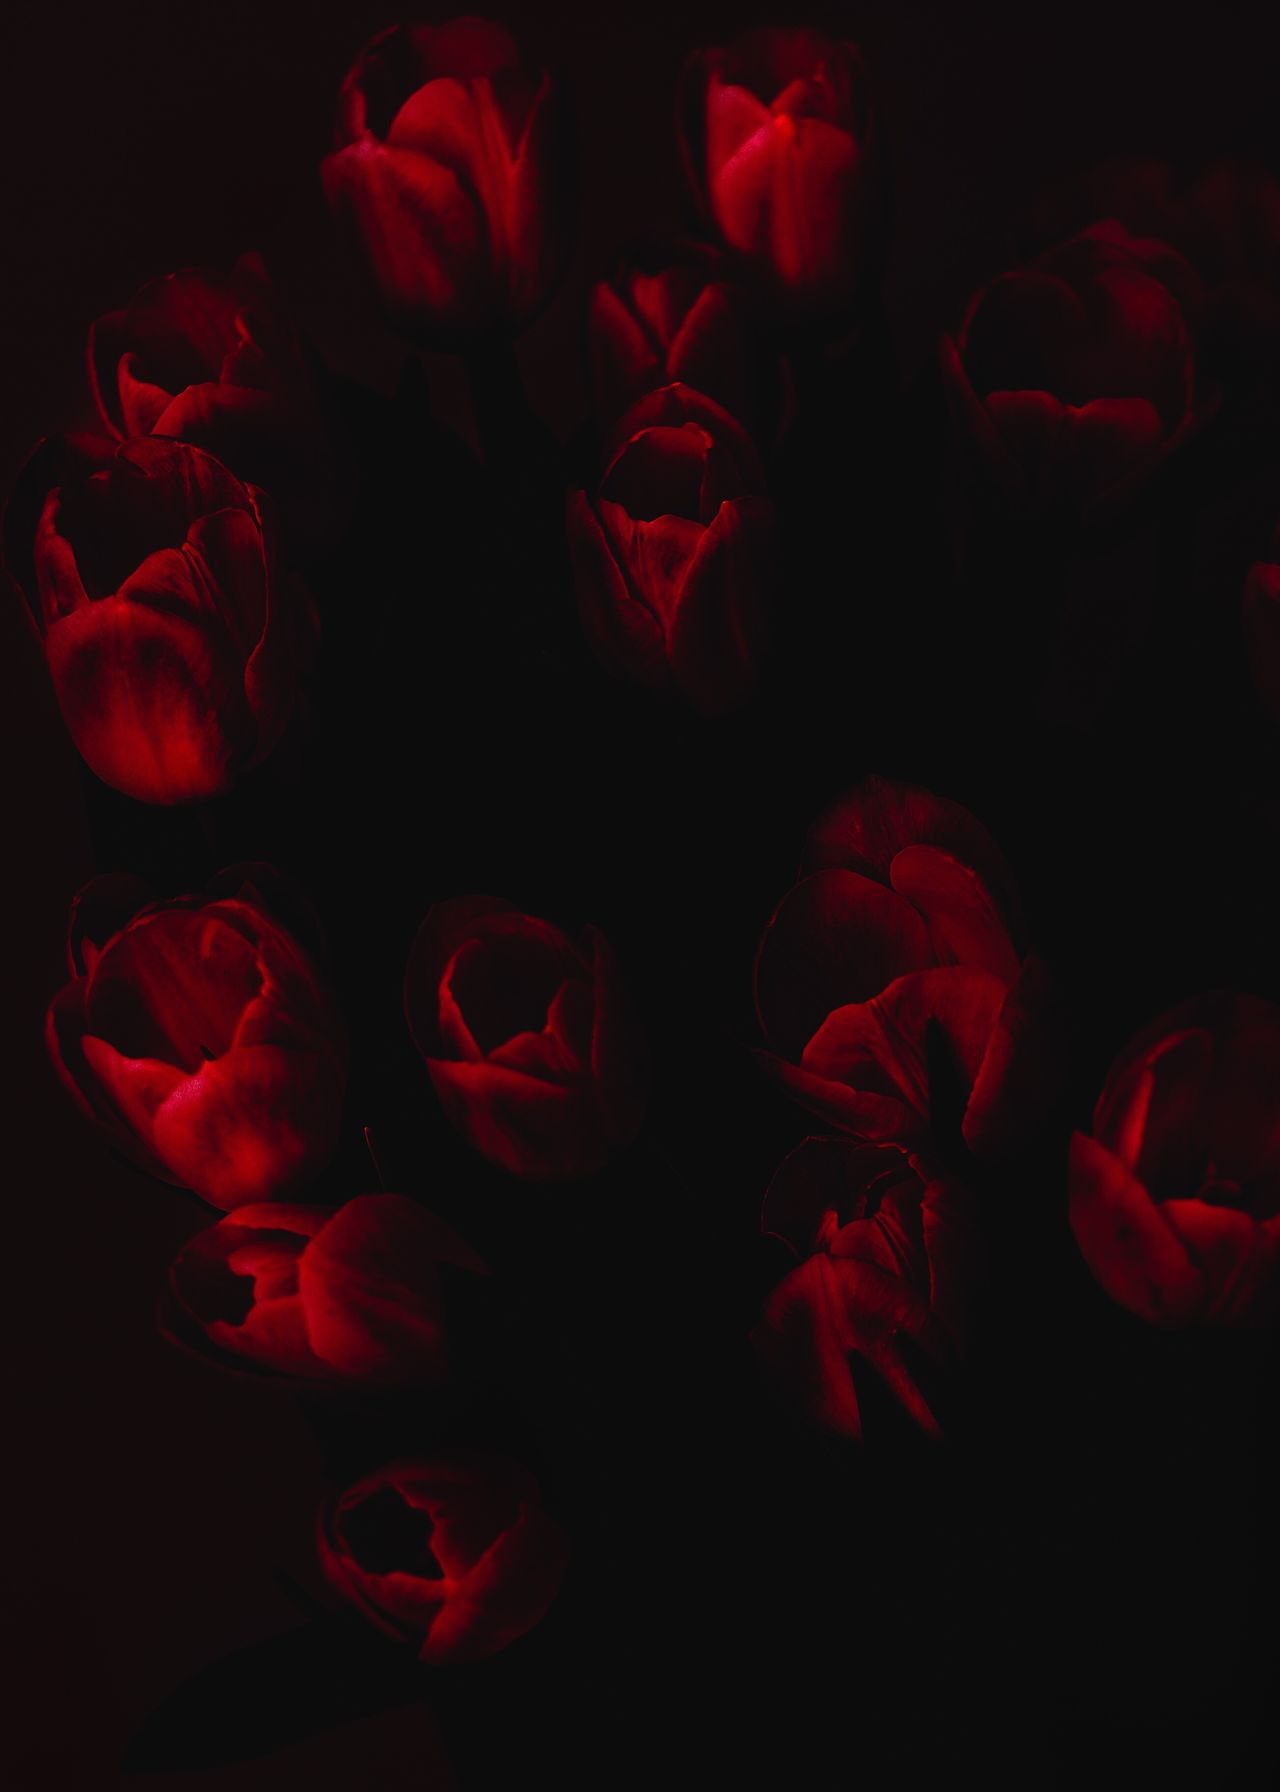 Tulips Red Flower Studio Shot No People Petal Black Background Freshness Close-up Beauty In Nature Backgrounds Indoors  Nature Rose - Flower Fragility Fujifilm_xseries Fujifilm EyeEmBestEdits EyeEm Best Shots EyeEm EyeEmBestPics EyeEm Gallery EyeEm Best Edits Netherlands The Week Of Eyeem